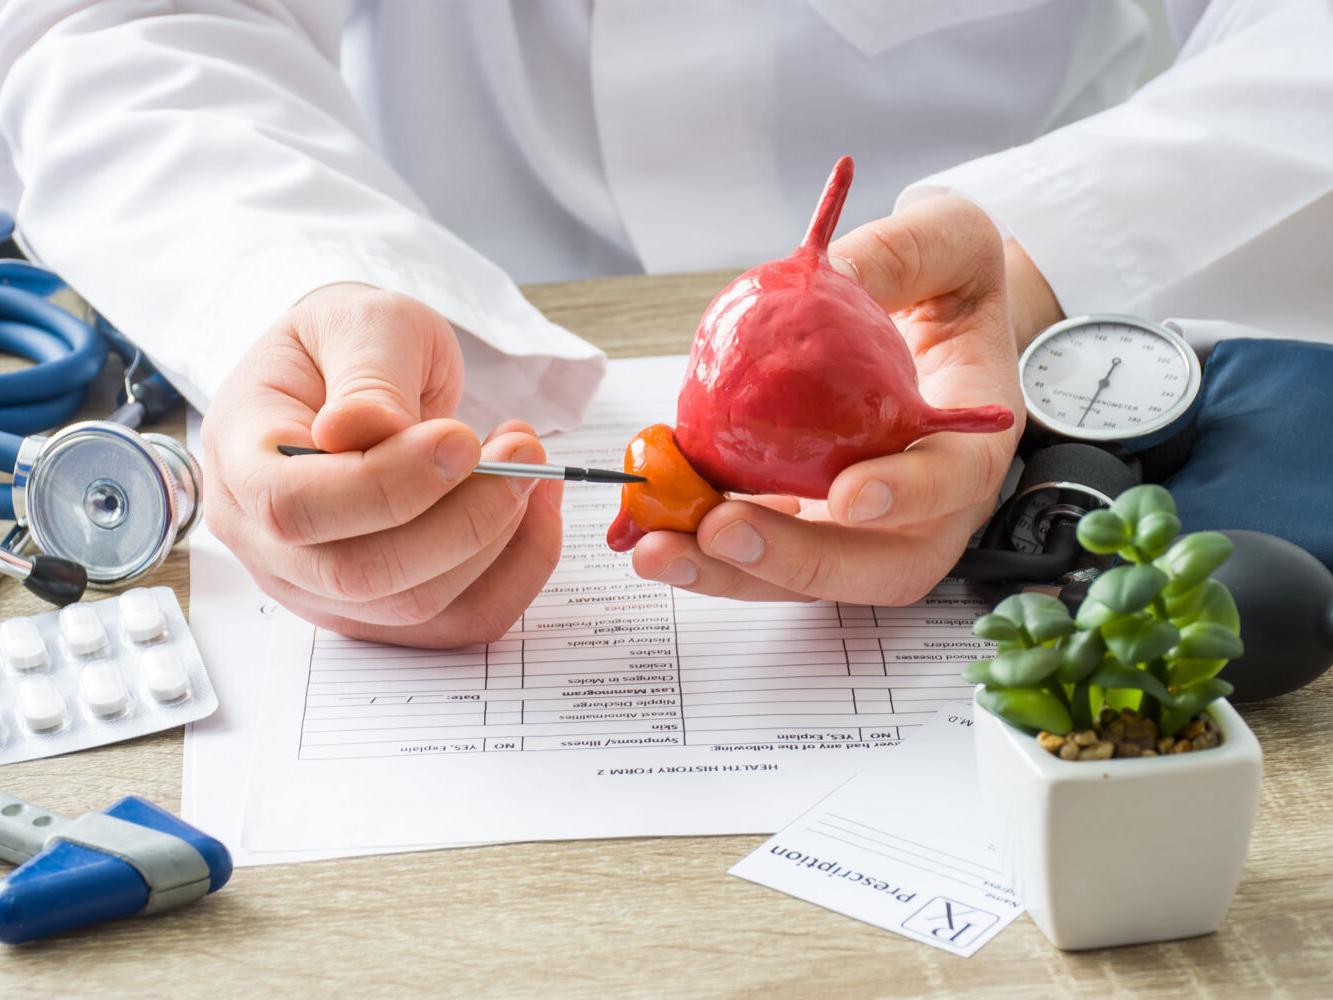 BPH And Kidney Failure